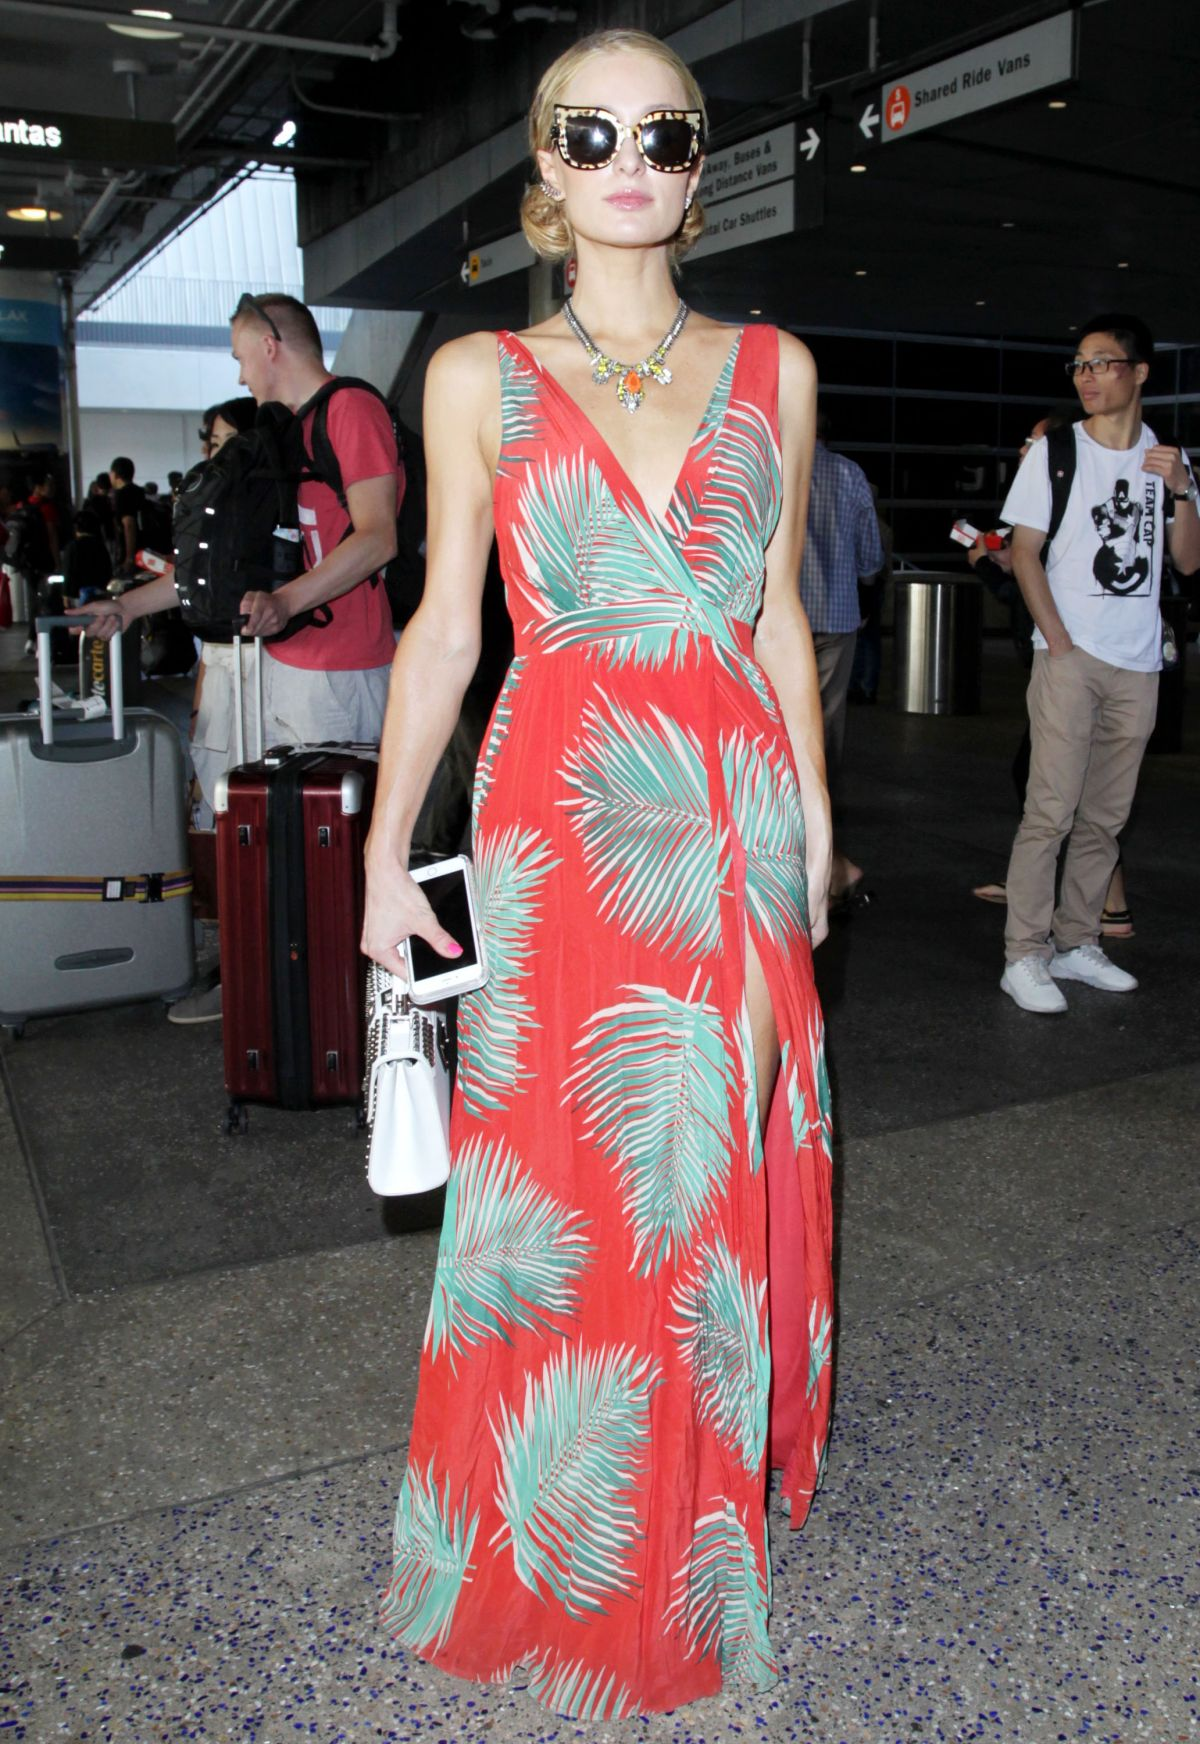 PARIS HILTON at Los Angeles International Airport 08/28/2016